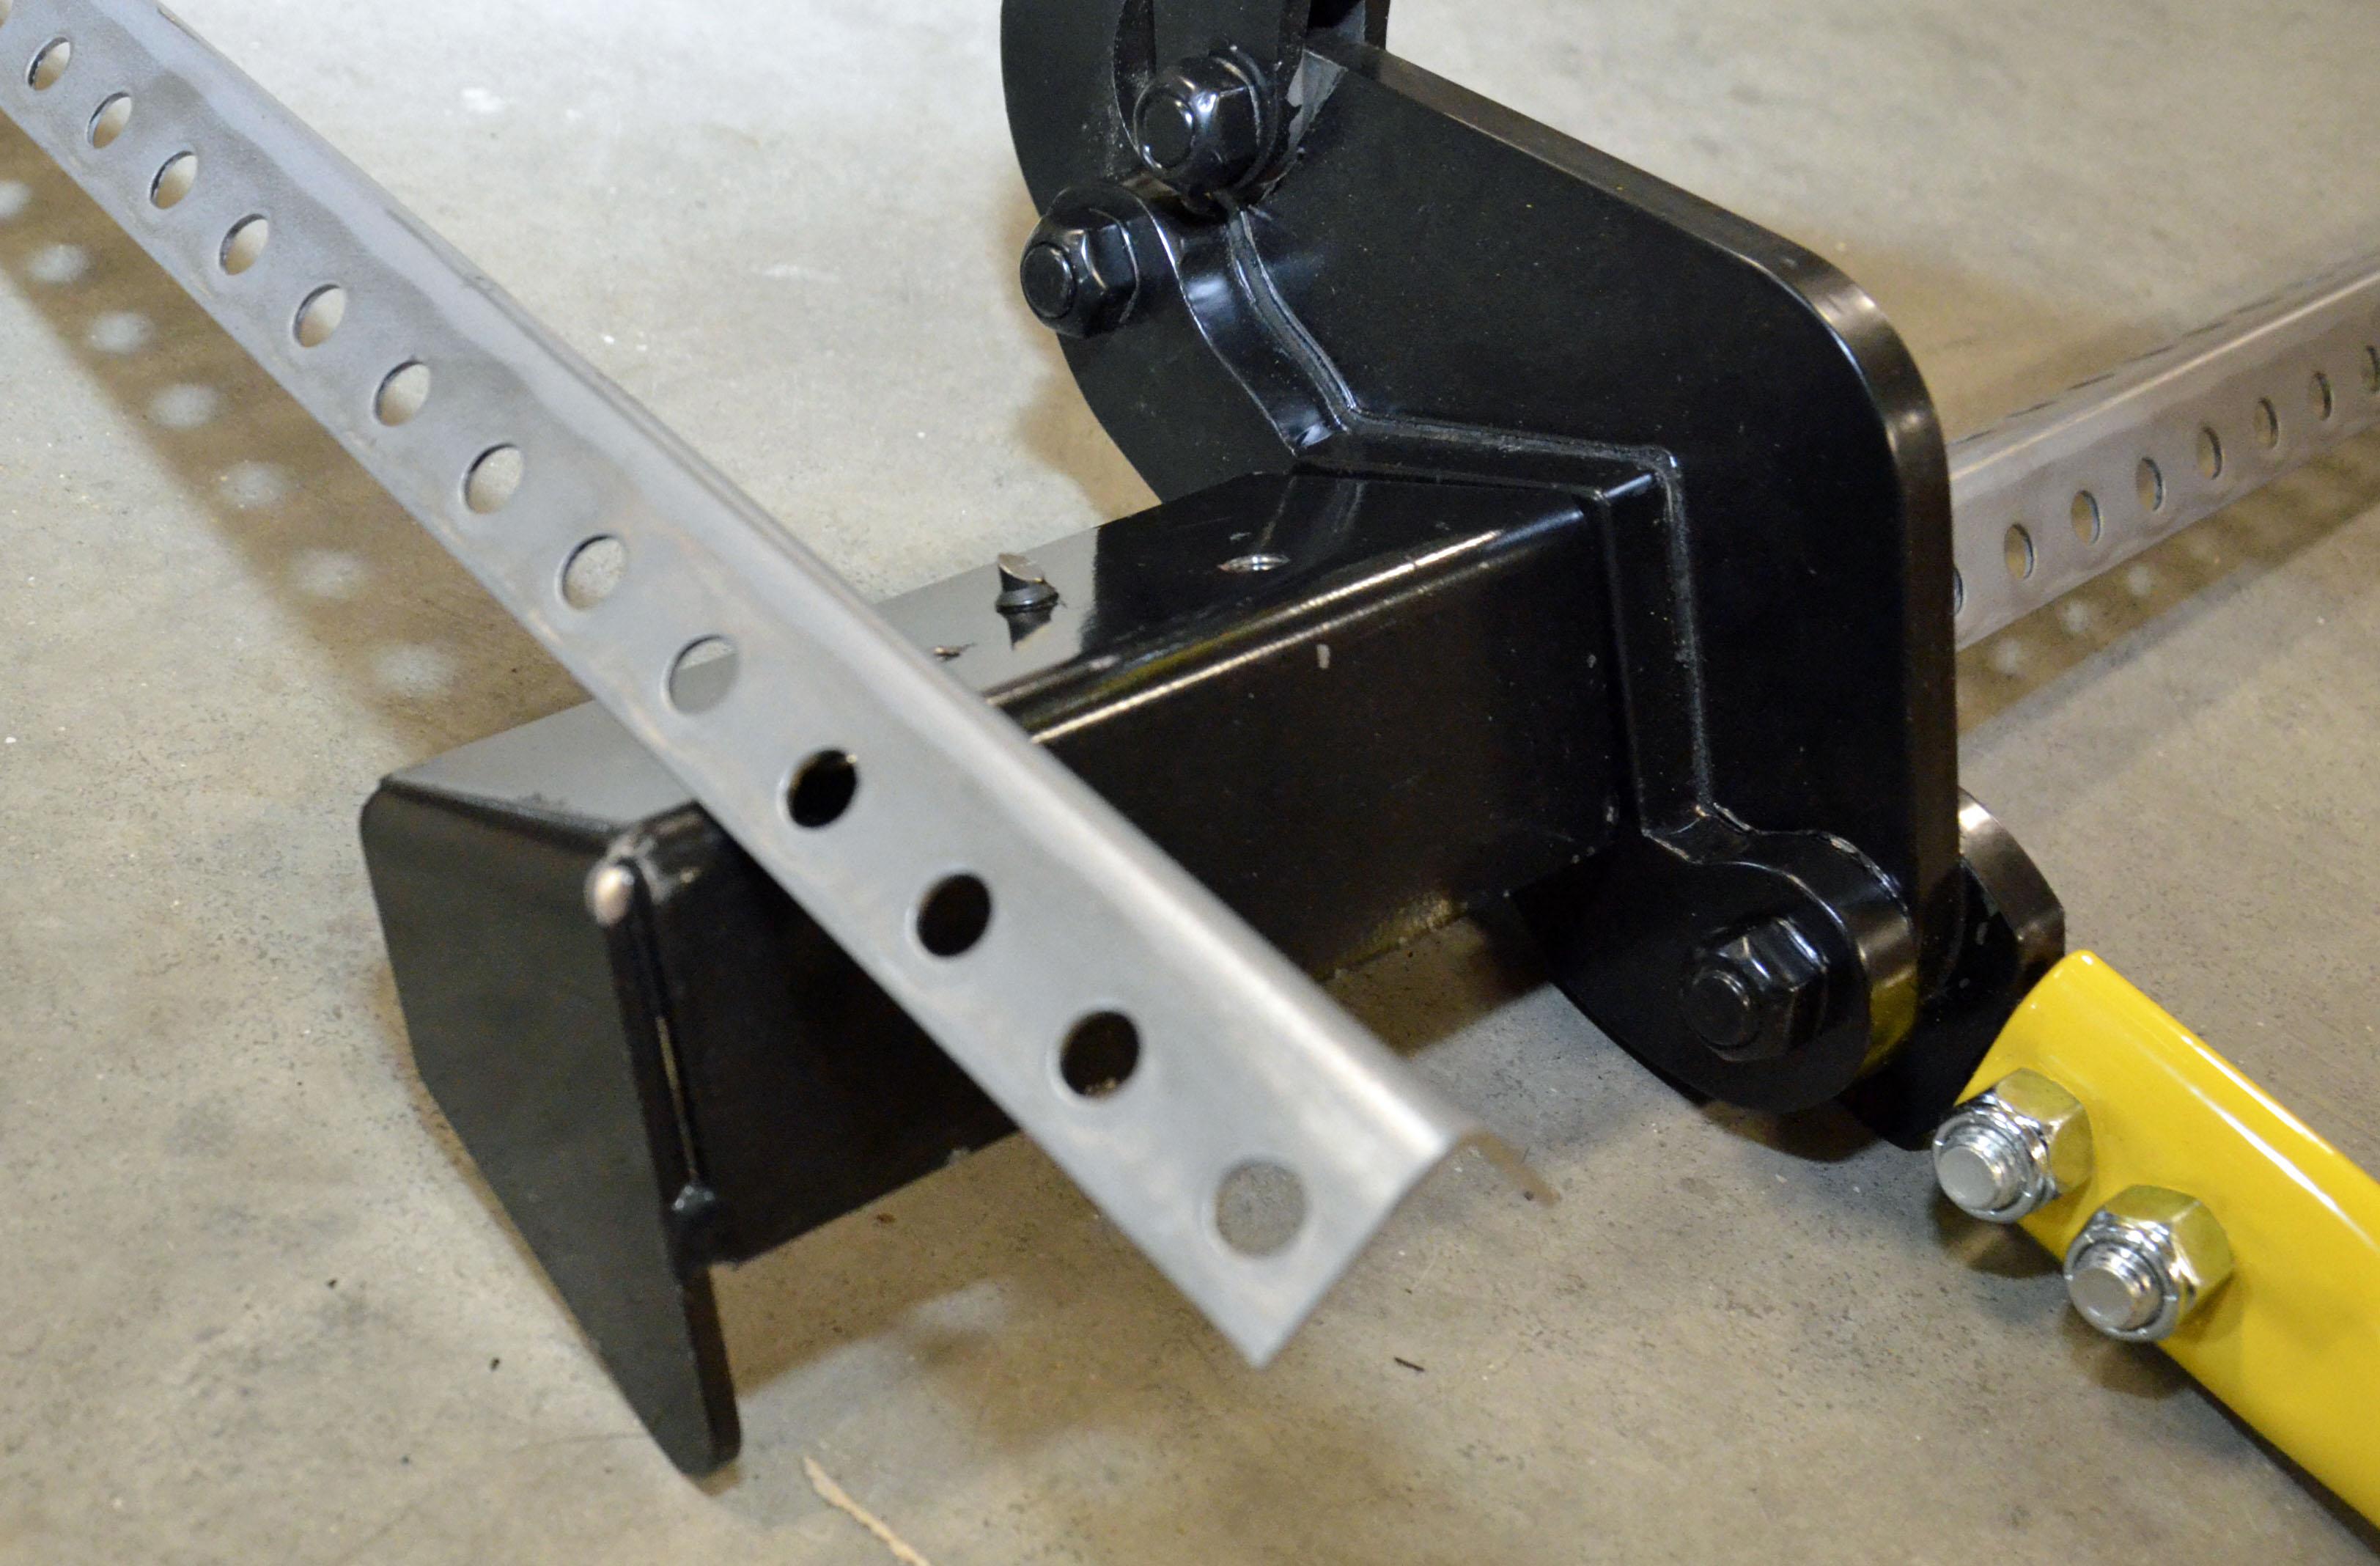 Angle Iron Cutter & Angle Iron Cutter - Garage Door Stuff